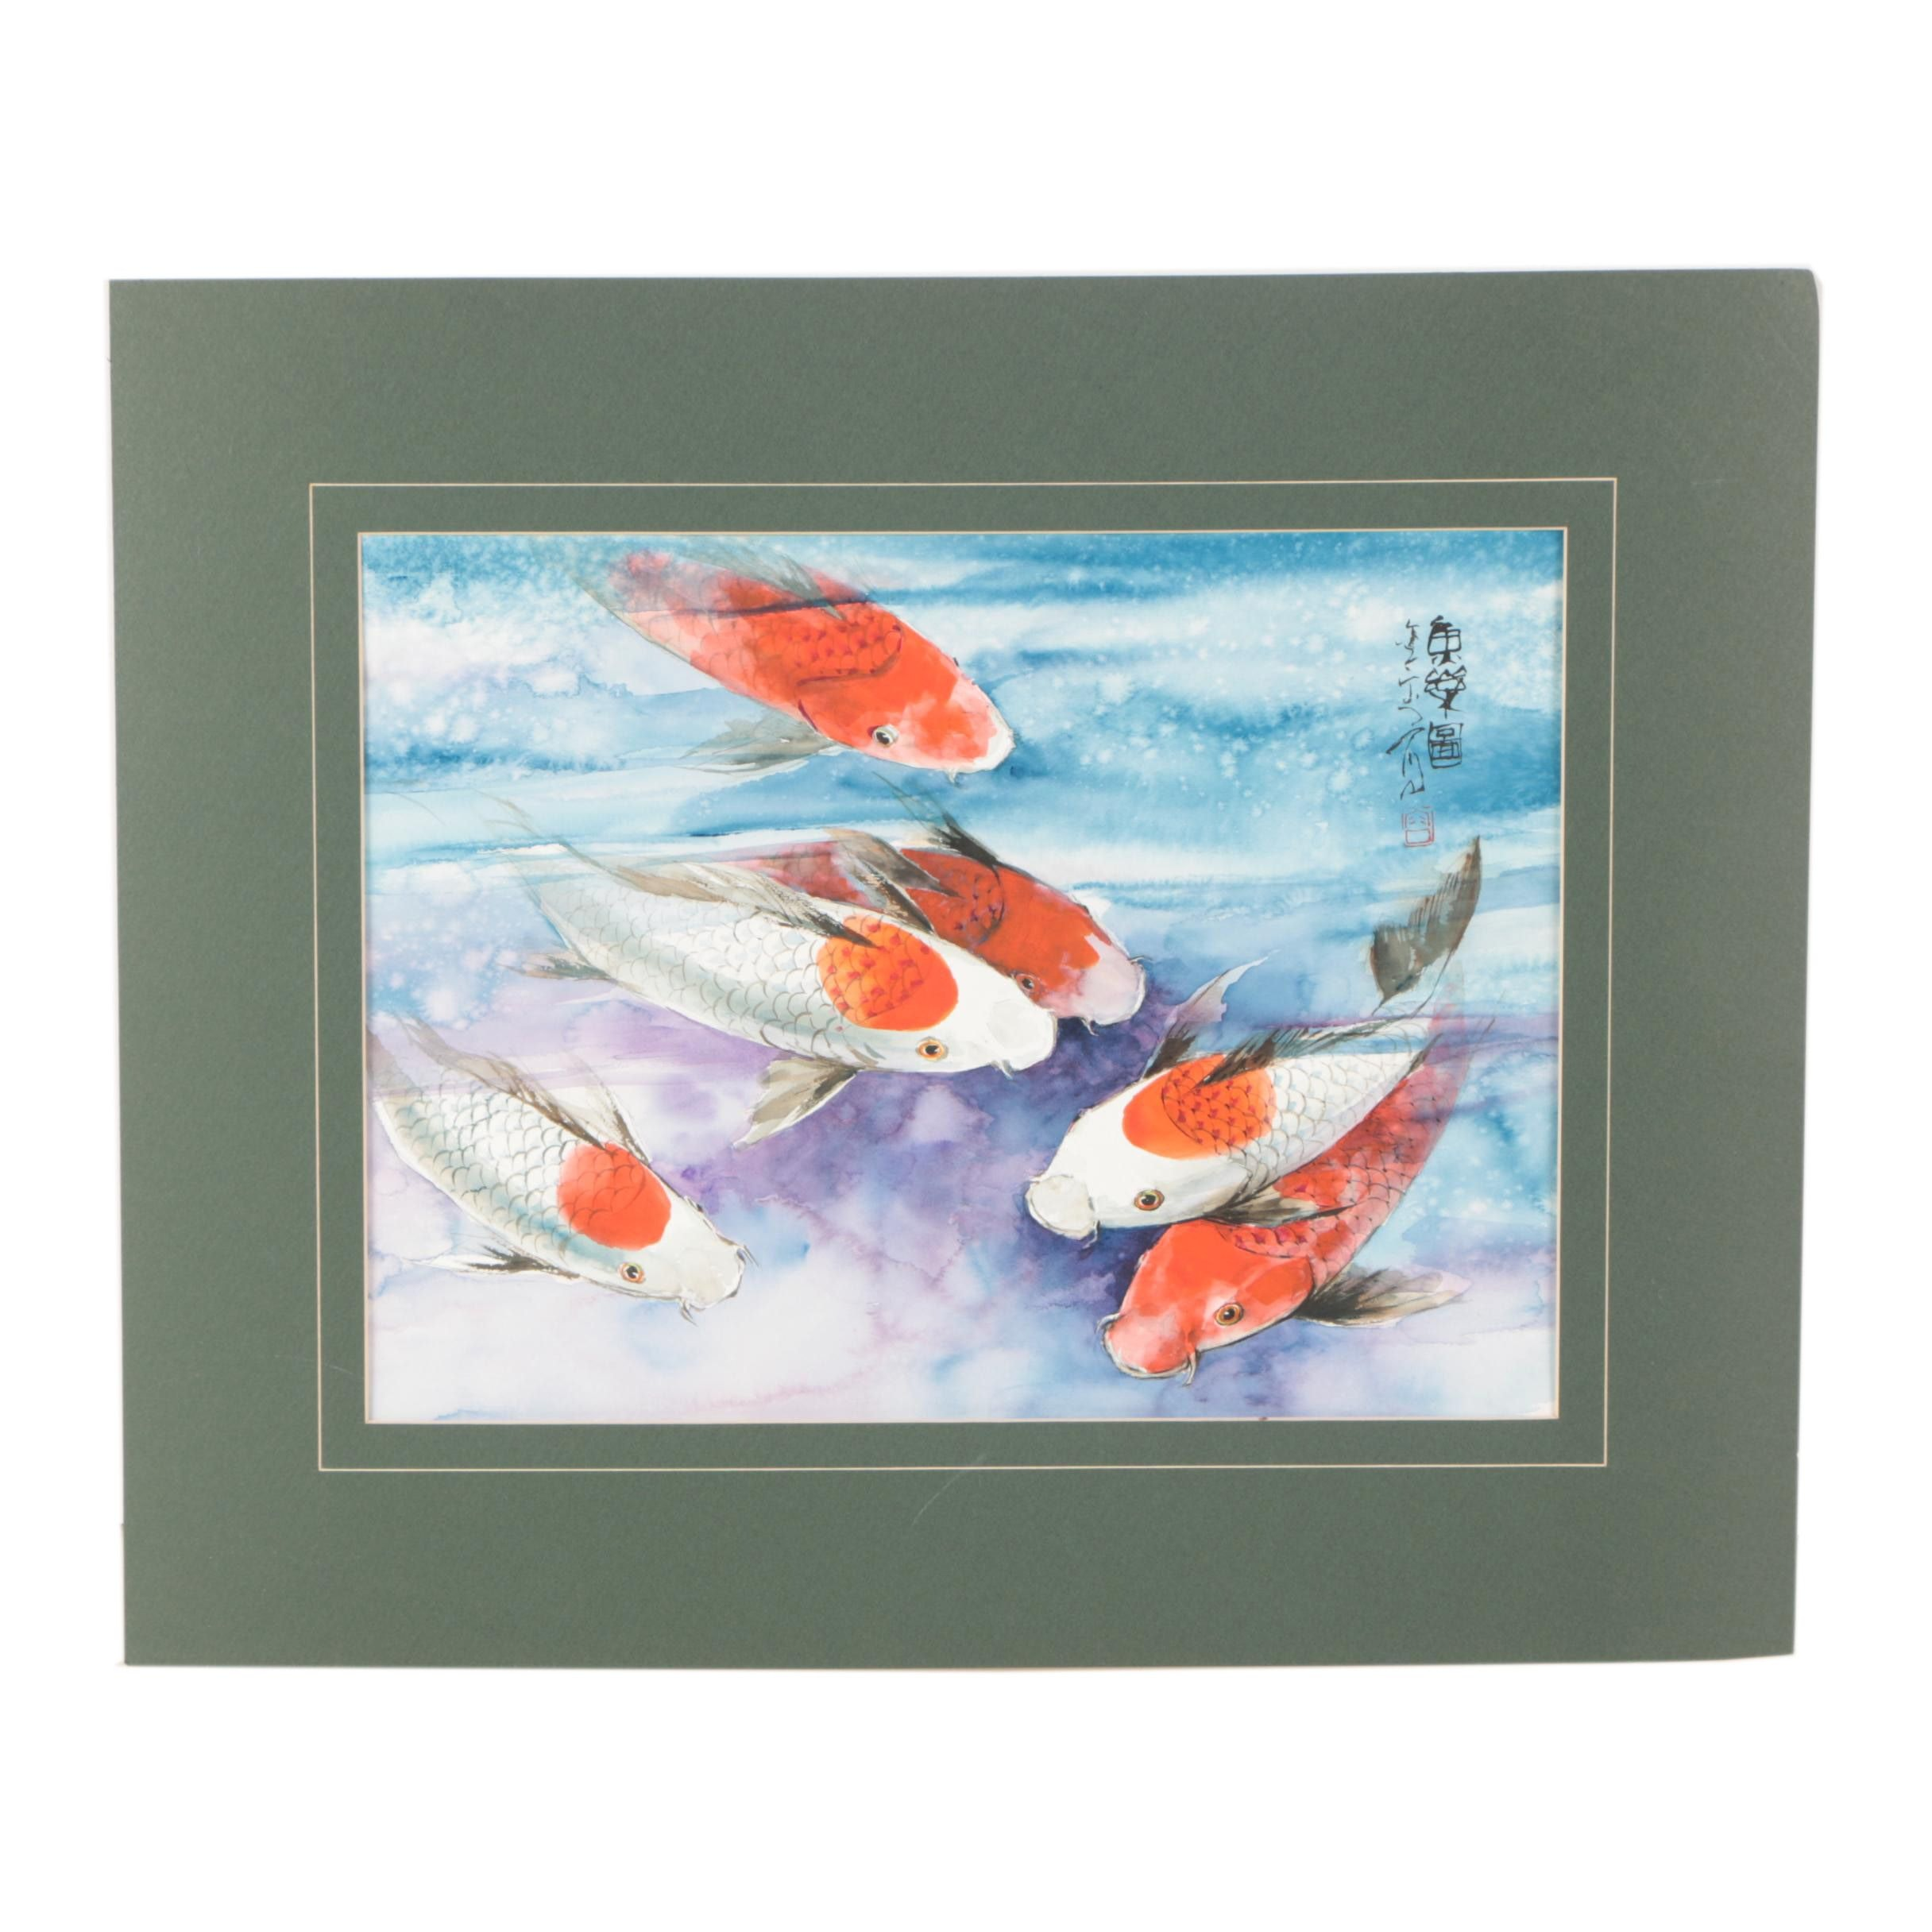 East Asian Watercolor Painting of Koi